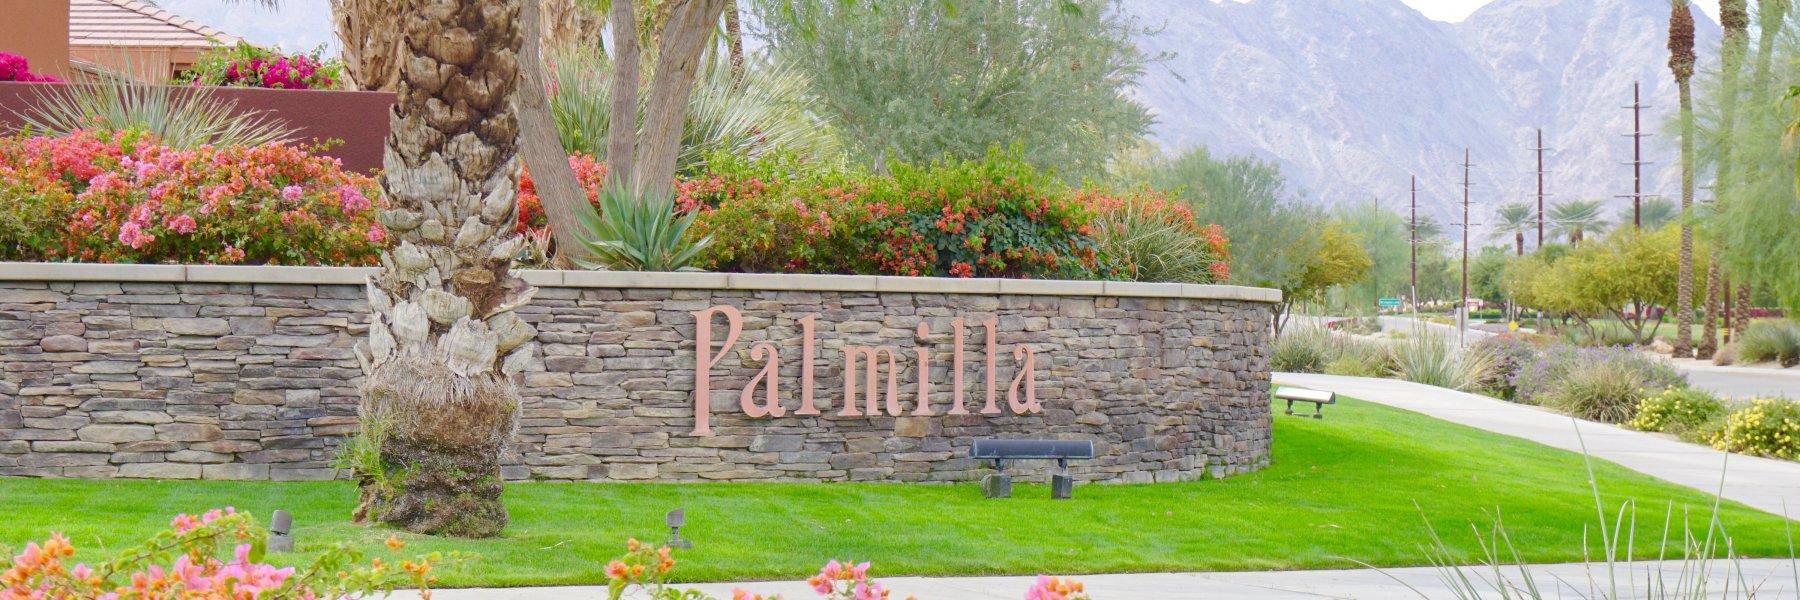 Palmilla is a community of homes in La Quinta California